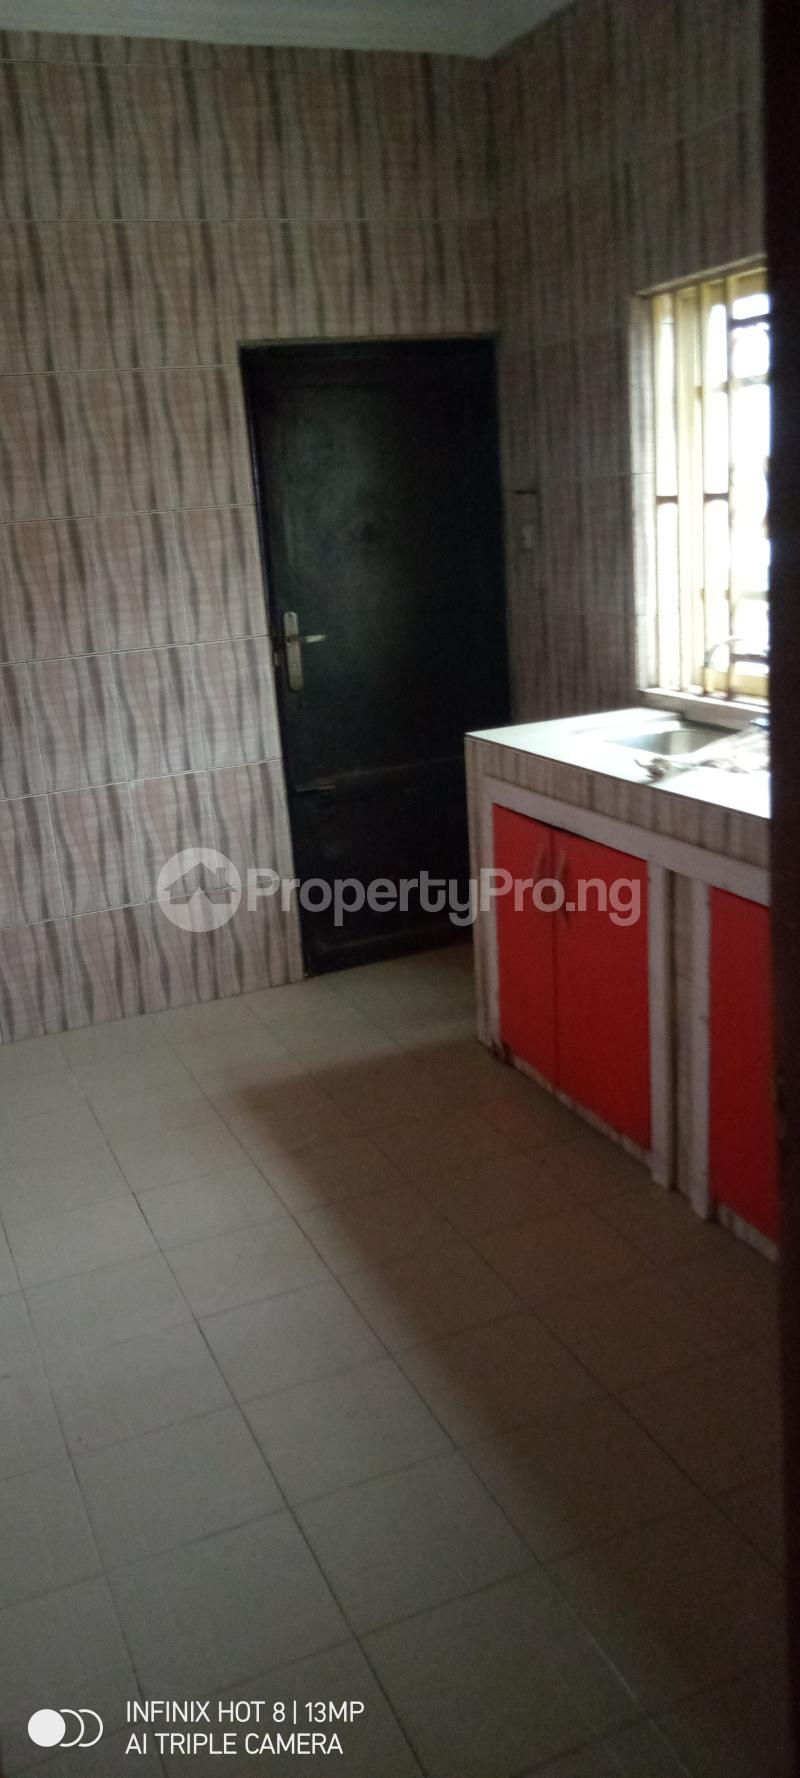 3 bedroom Flat / Apartment for rent Green field estate Amuwo Odofin Amuwo Odofin Lagos - 8